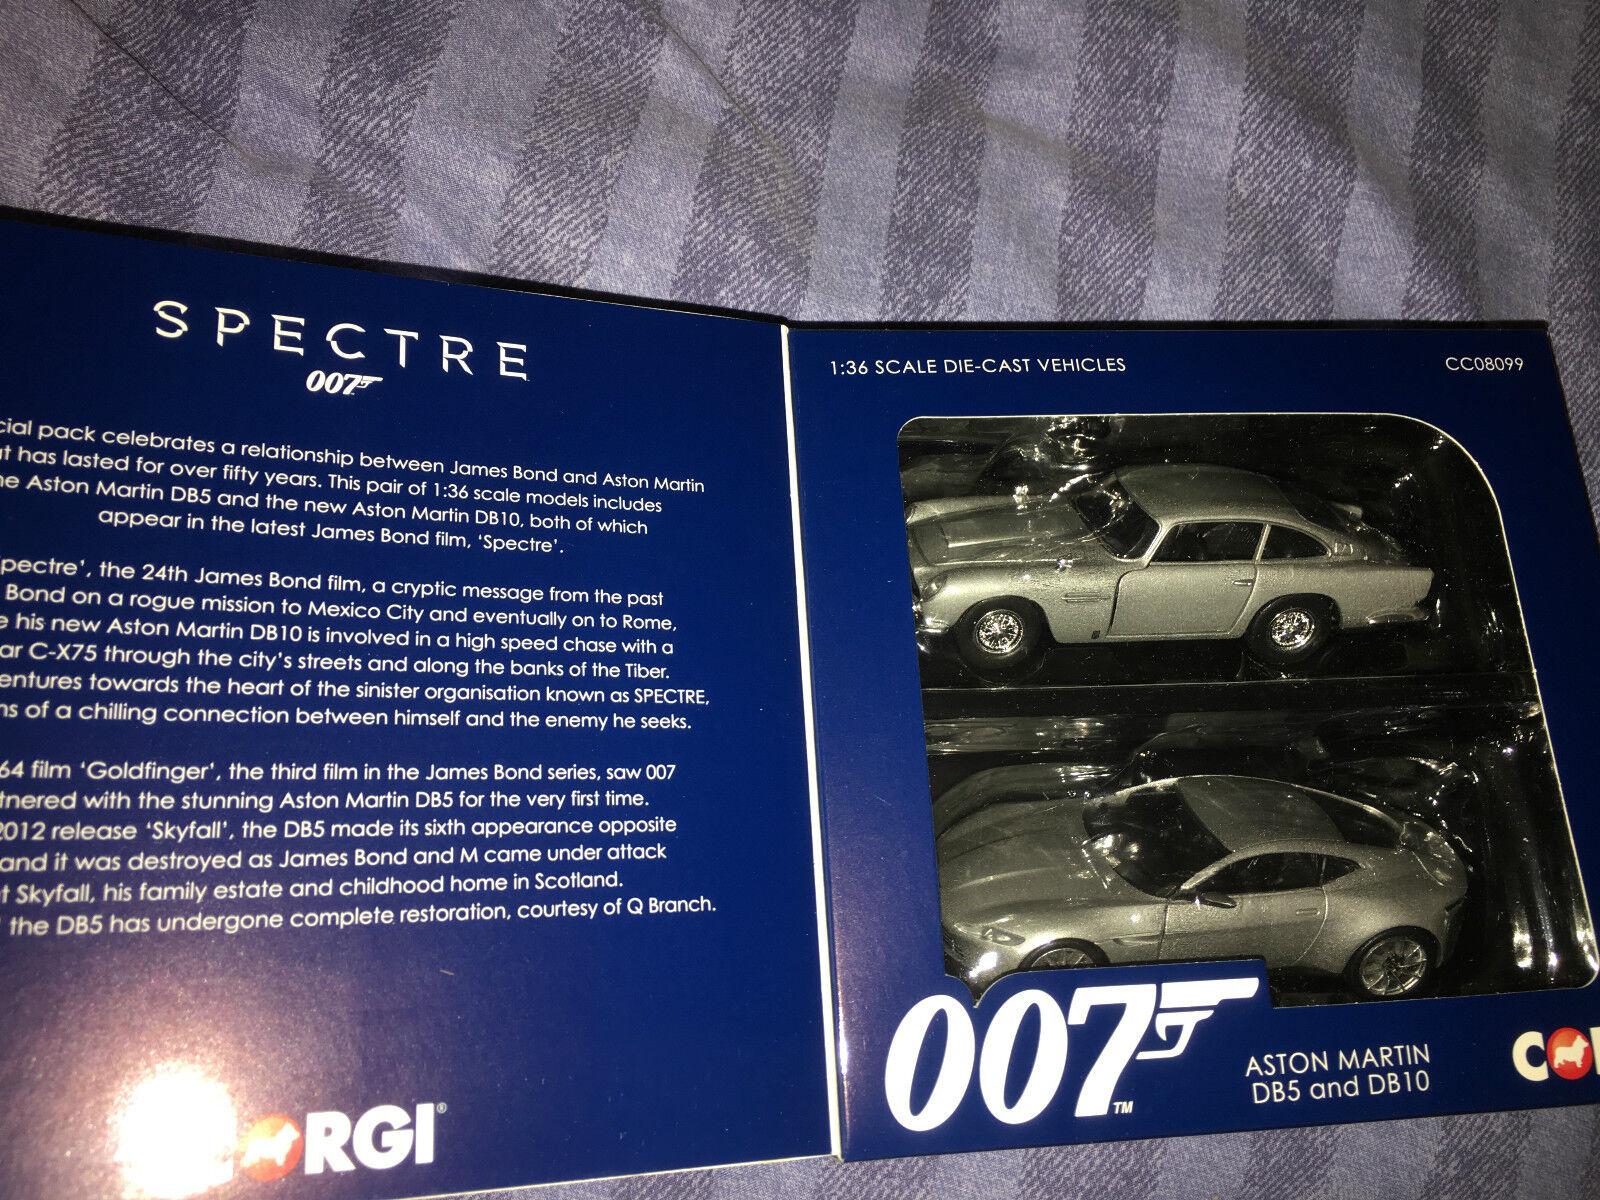 James Bond, spectre ASTON MARTIN DB5 et DB10 CORGI voiture modèle